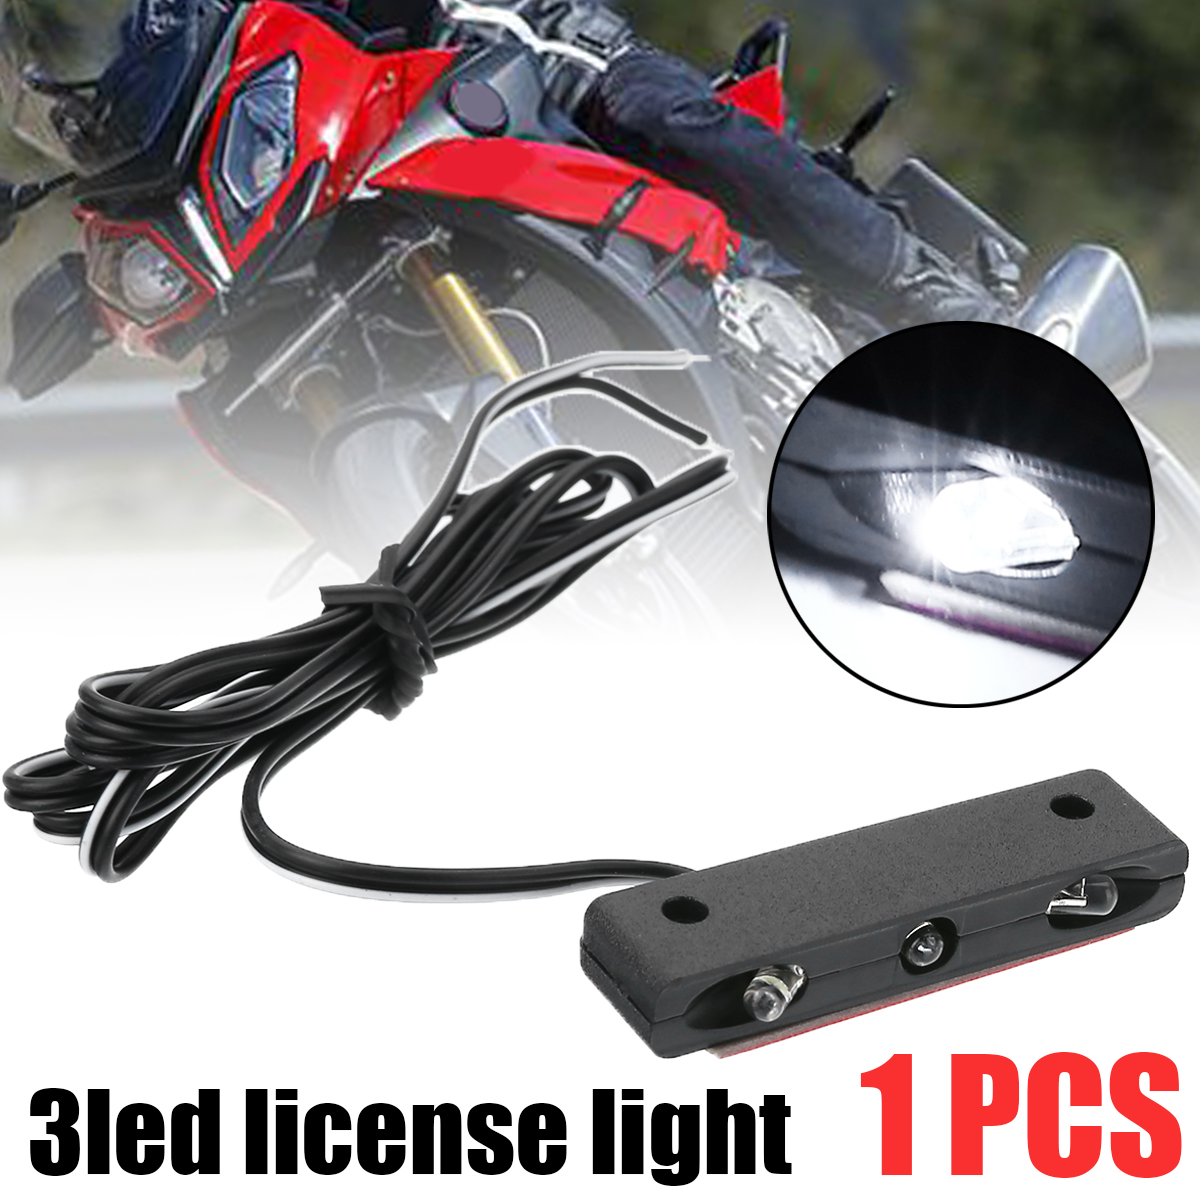 Mayitr 1pc Universal Motorcycle 3 LED License Plate White Light DC12V Motorbike Car Number Lamp